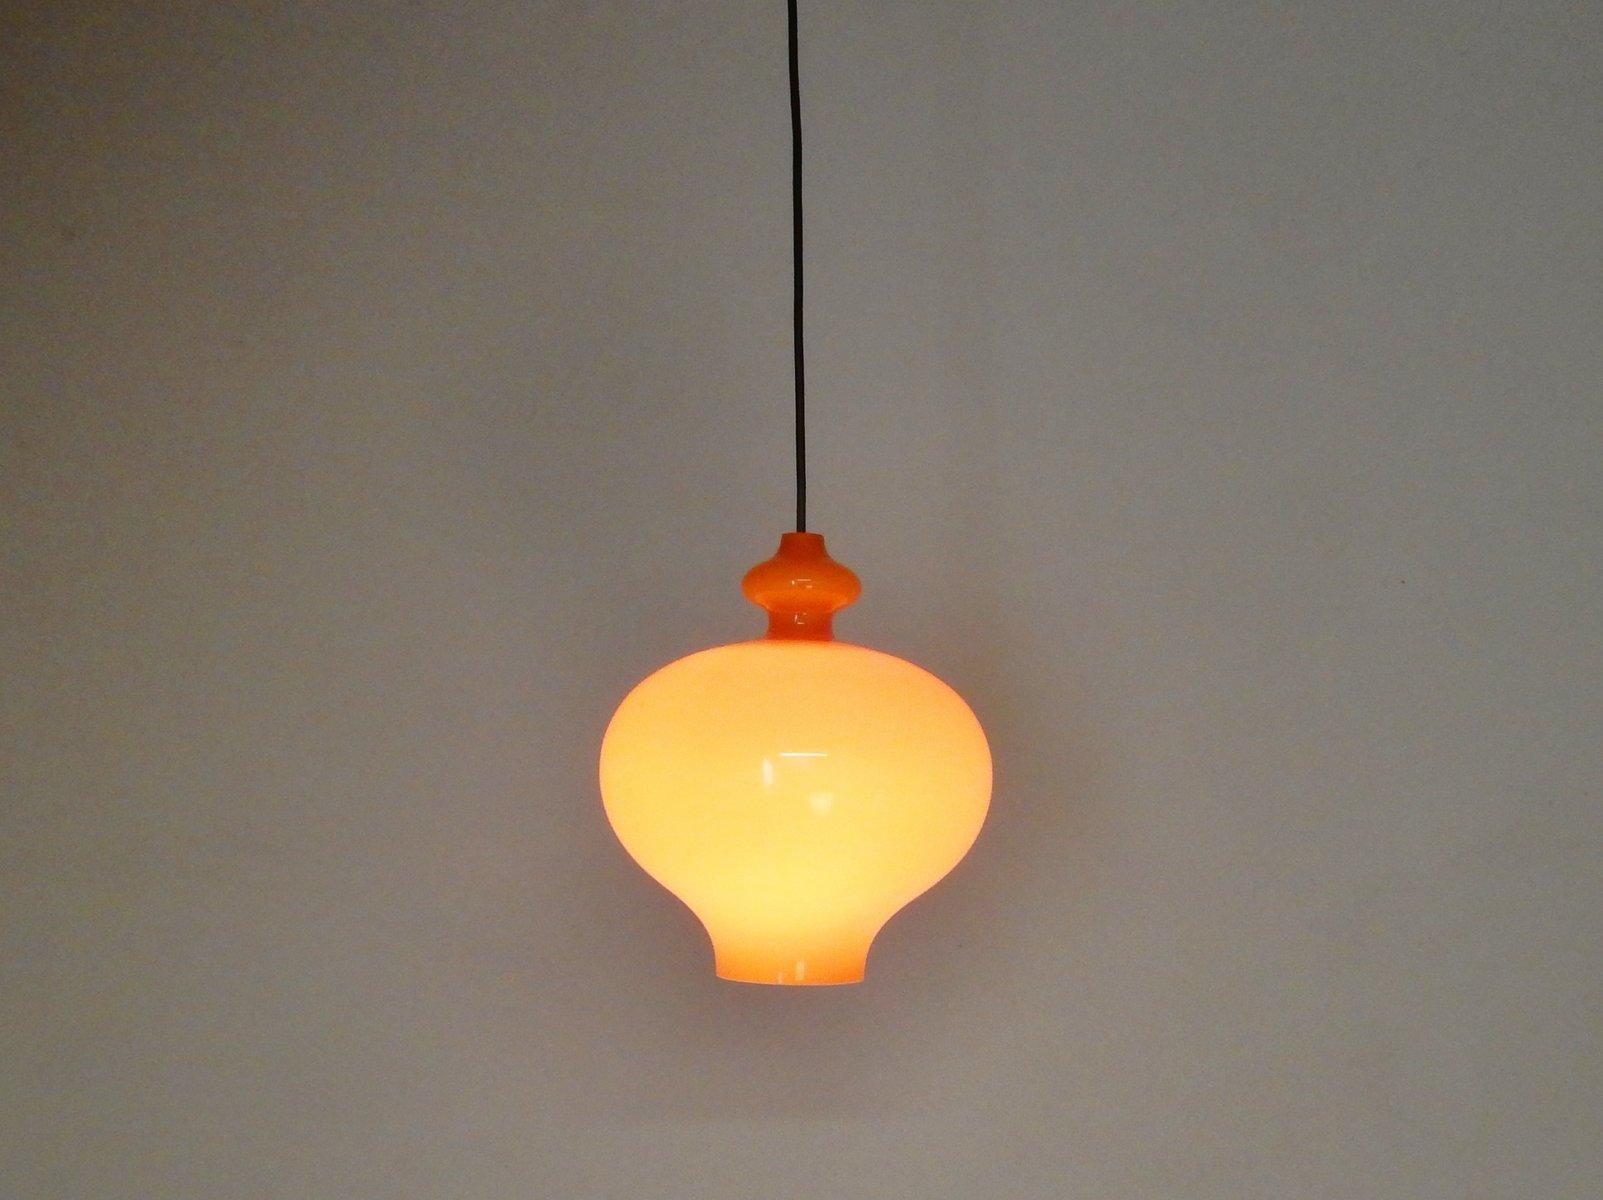 Orange glass pendant lights by hans agne jakobsson 1960s set of 2 129000 aloadofball Gallery